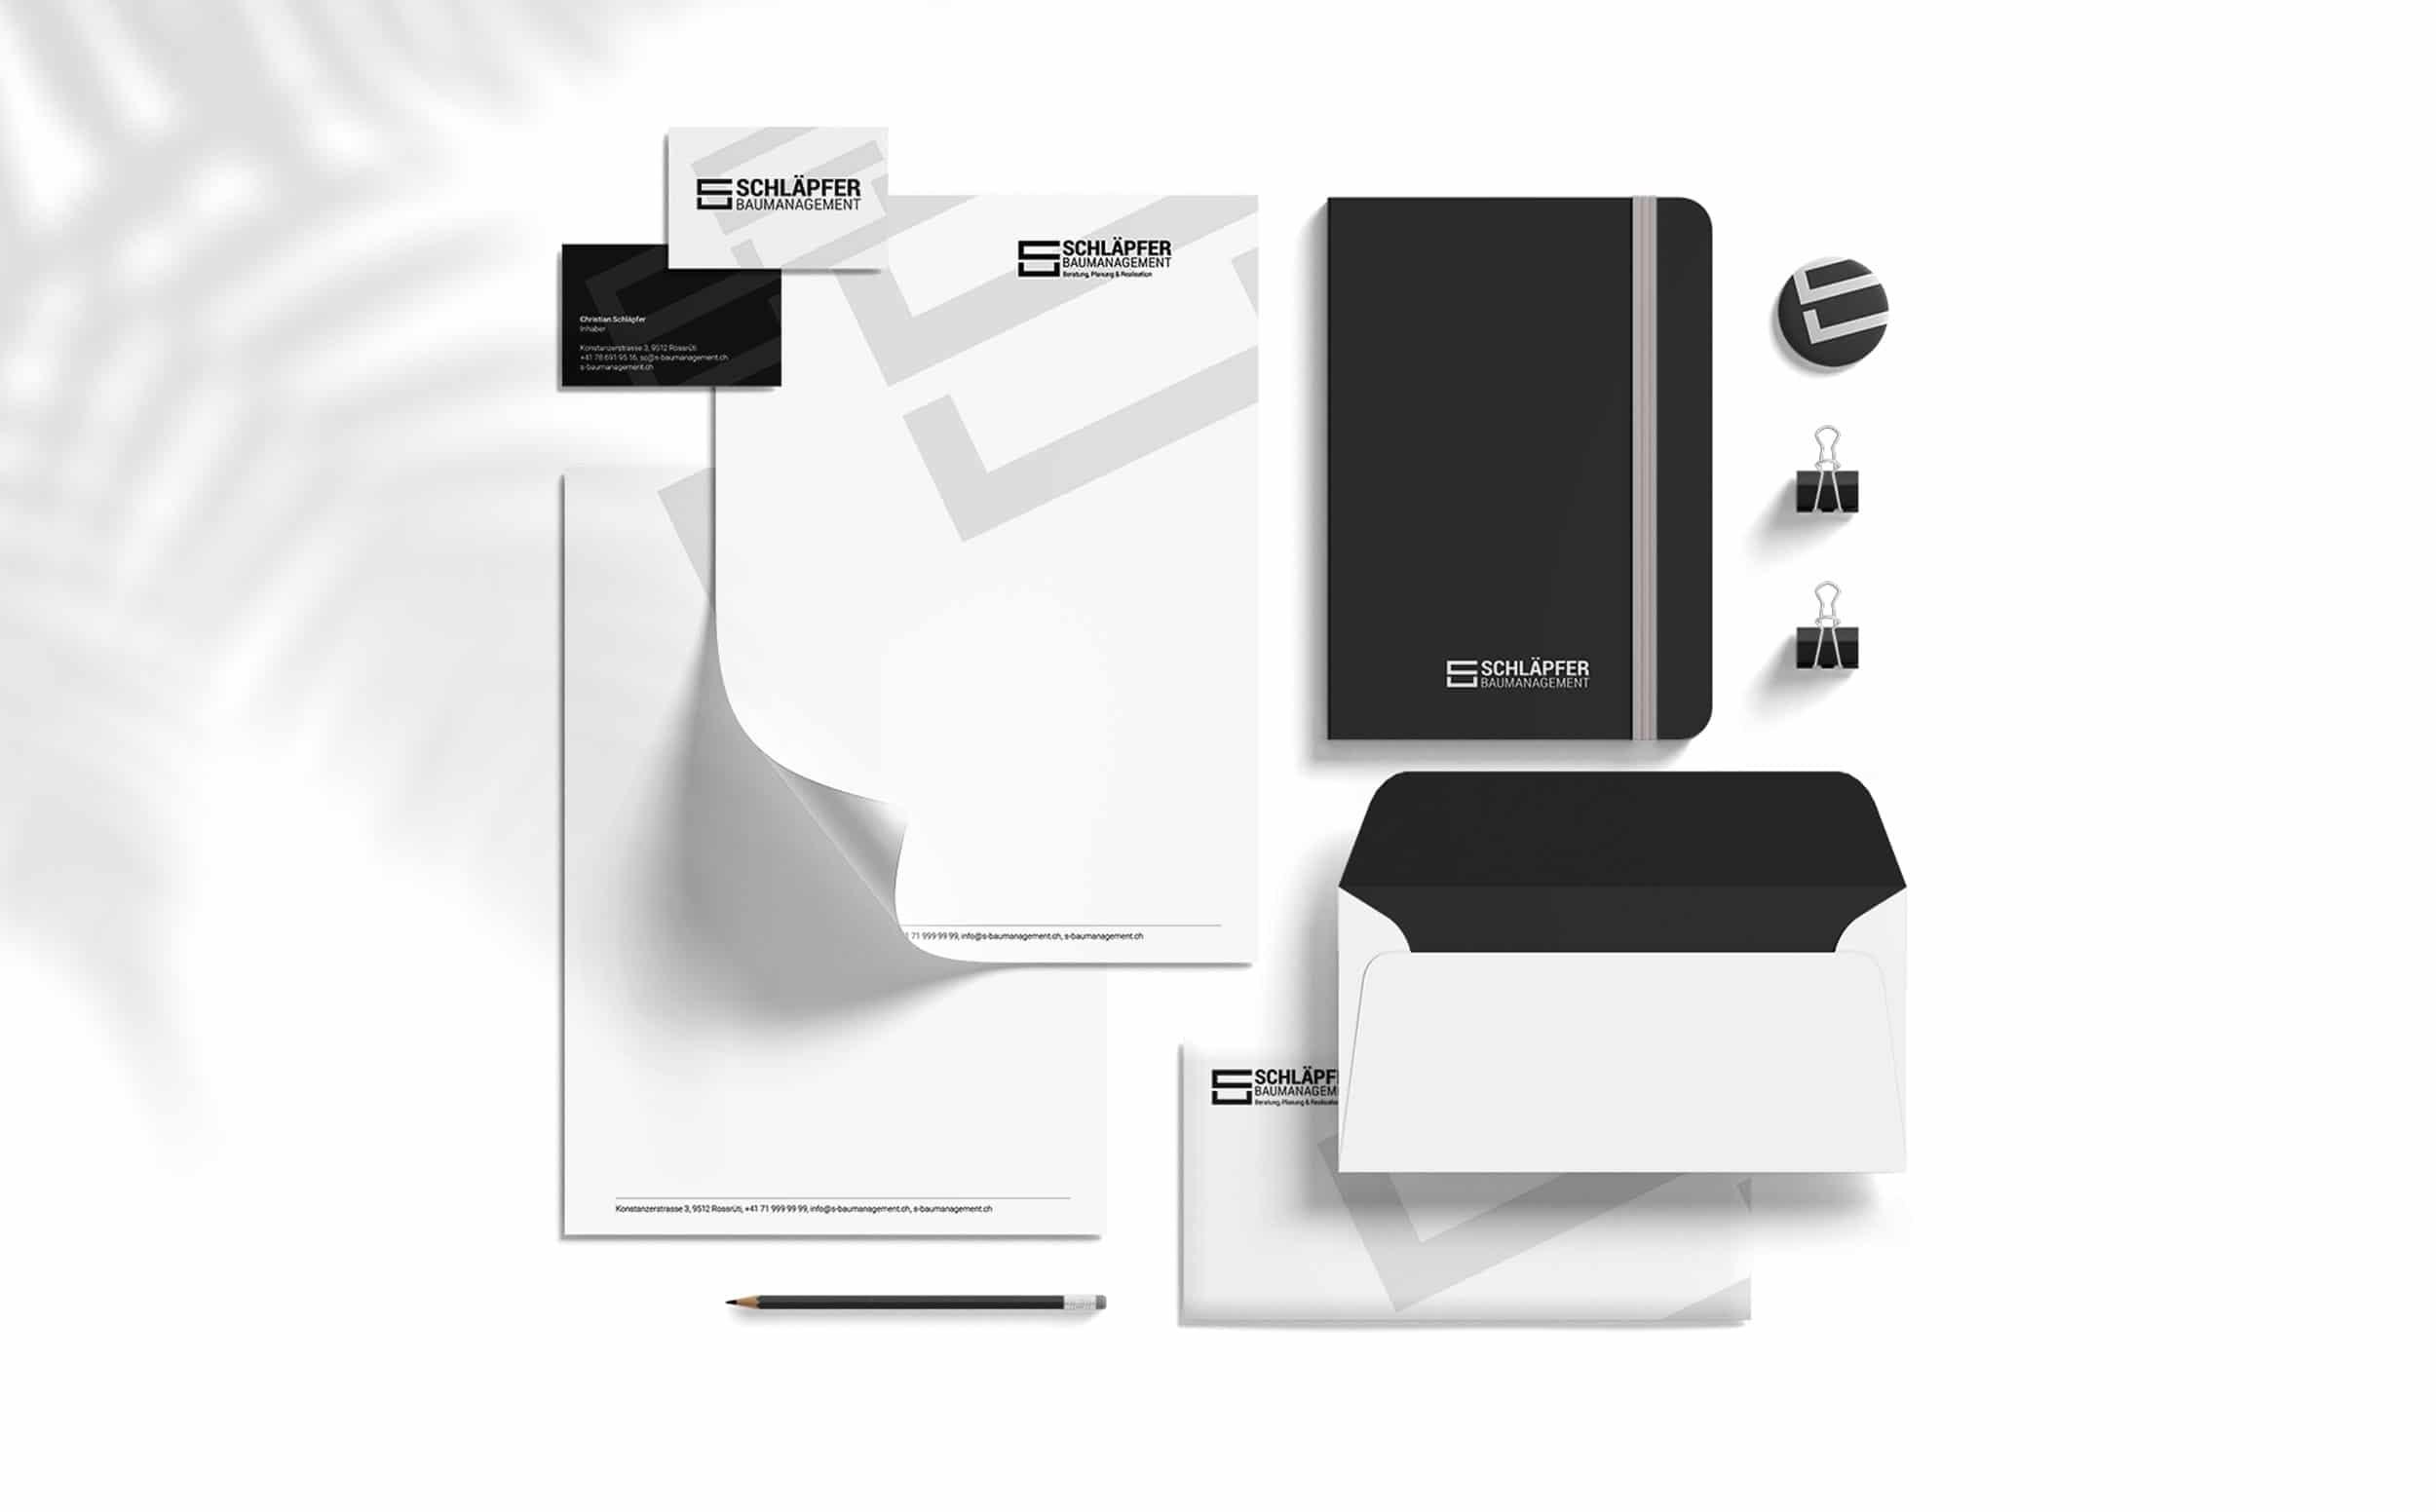 Branding-Mockup-S-Baumanagement-neu